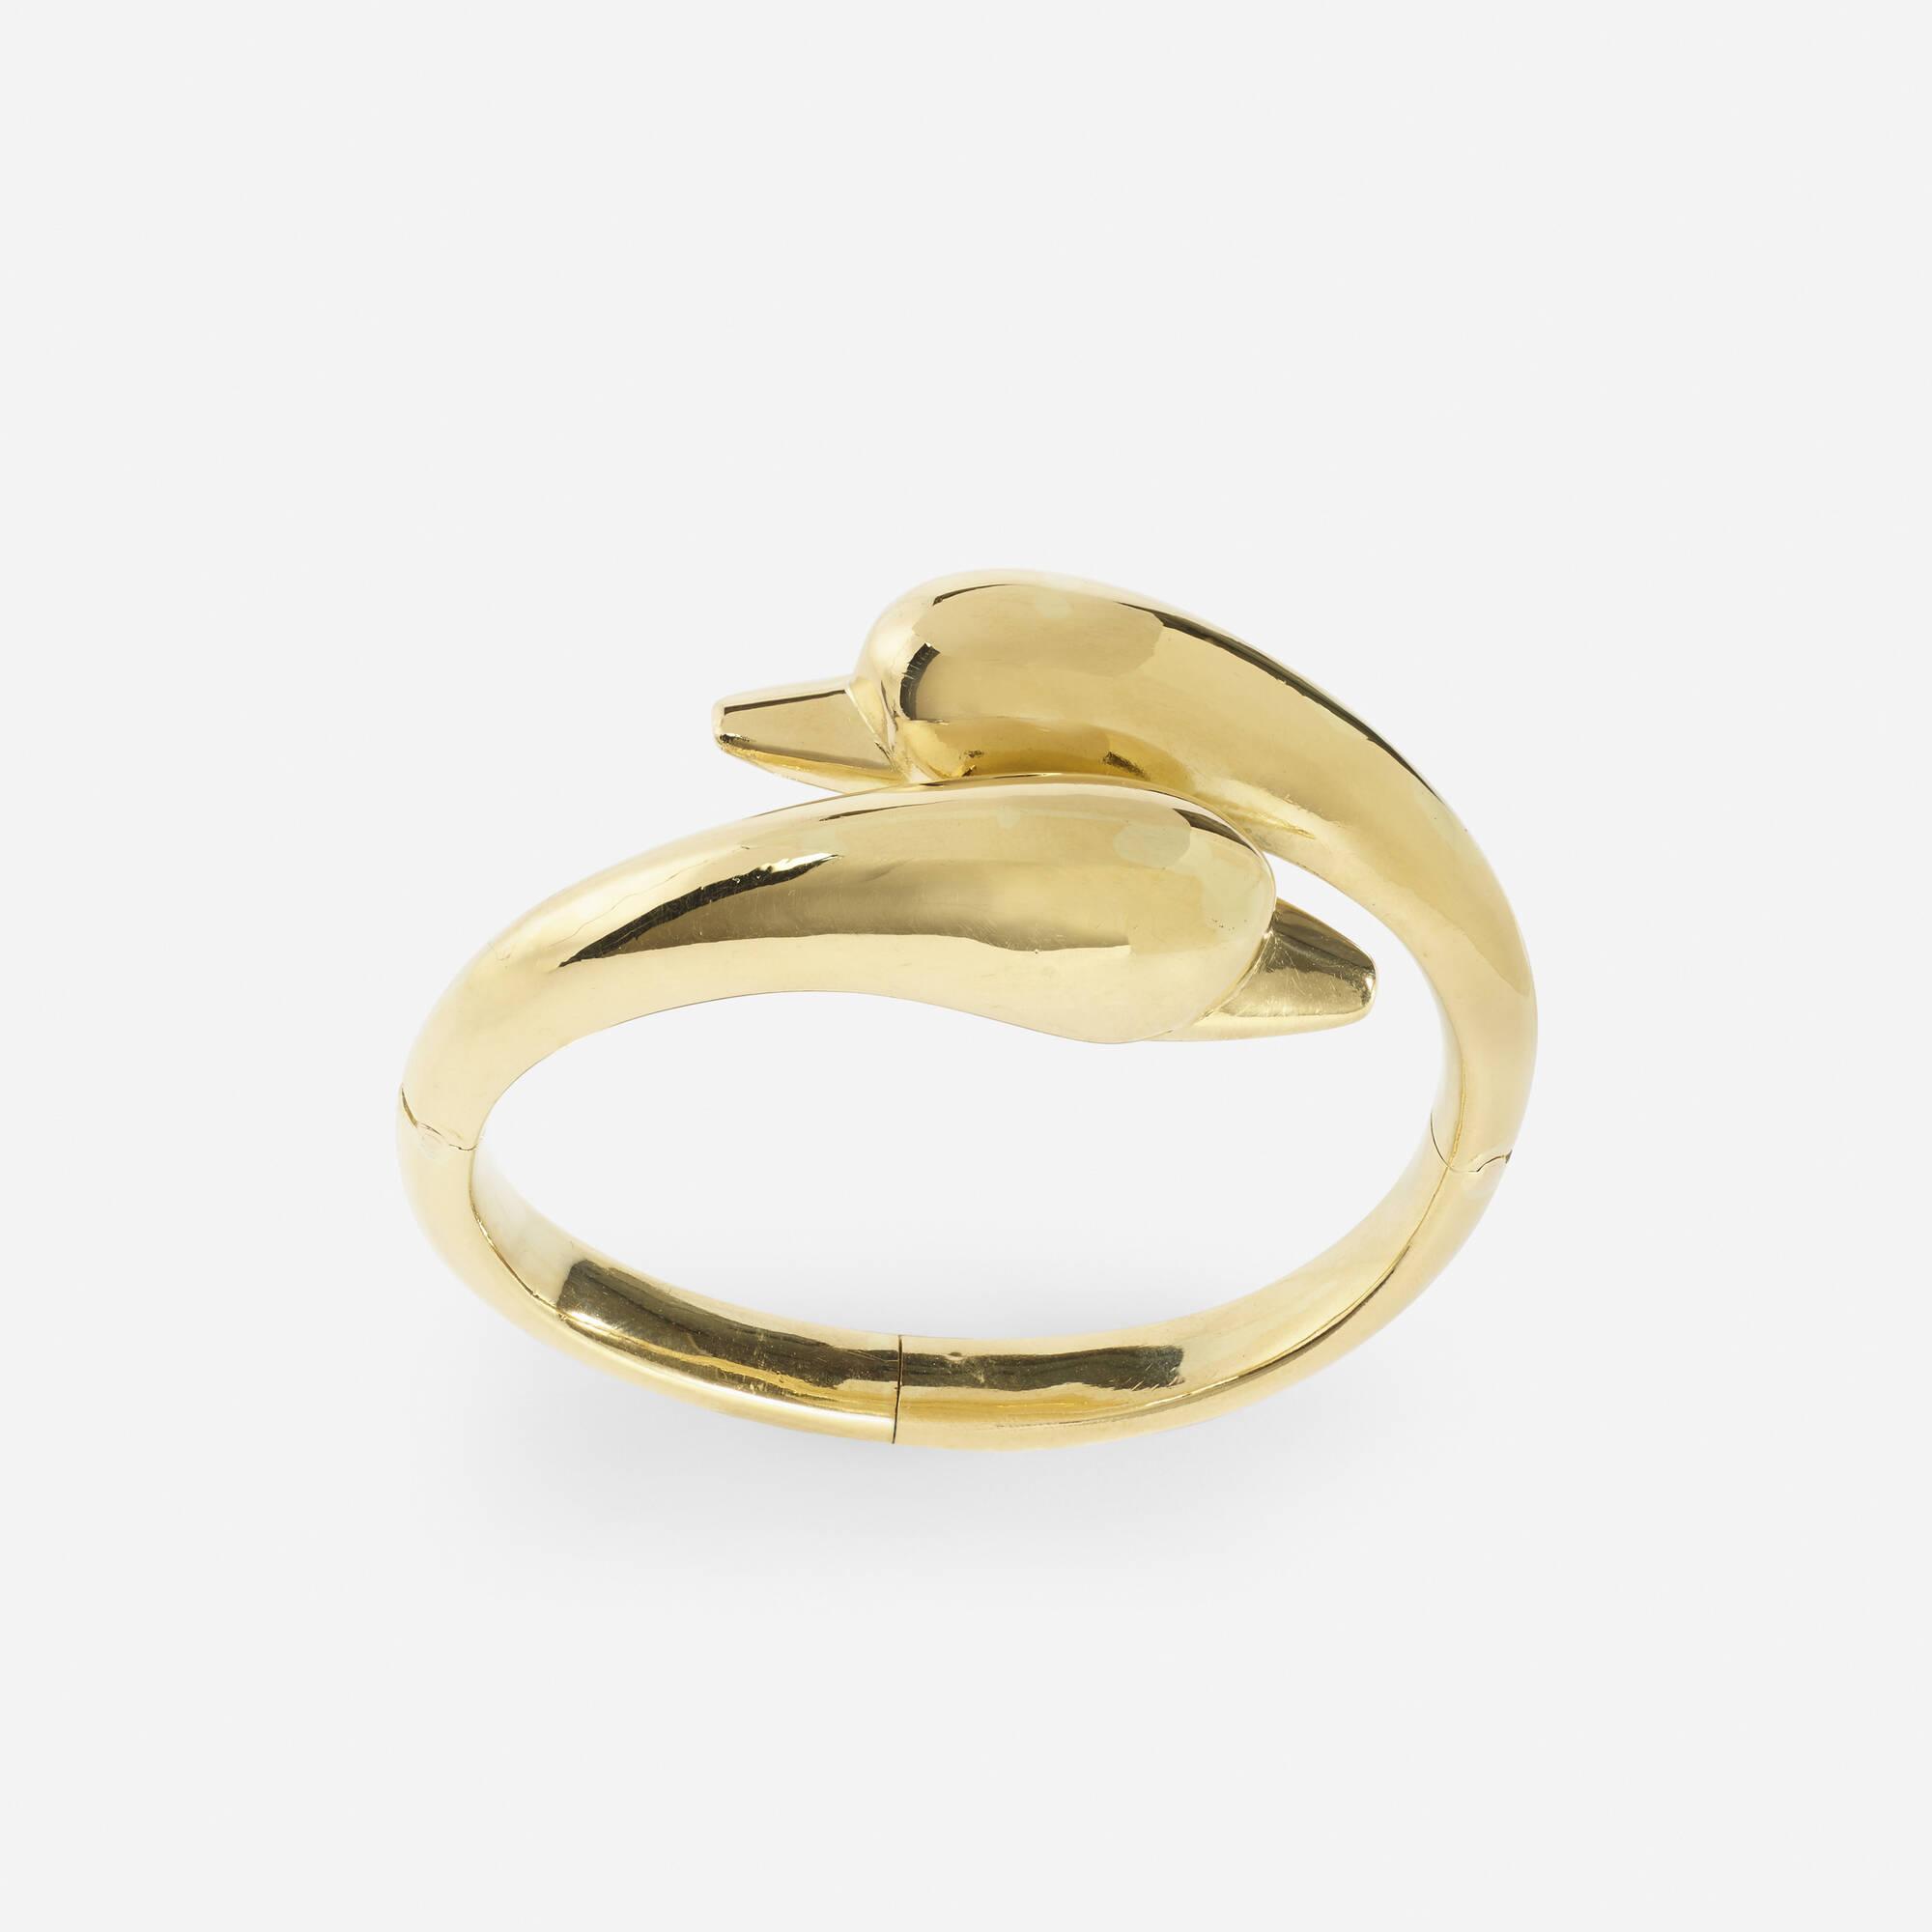 244: Lalaounis / A gold Swan bracelet (2 of 2)